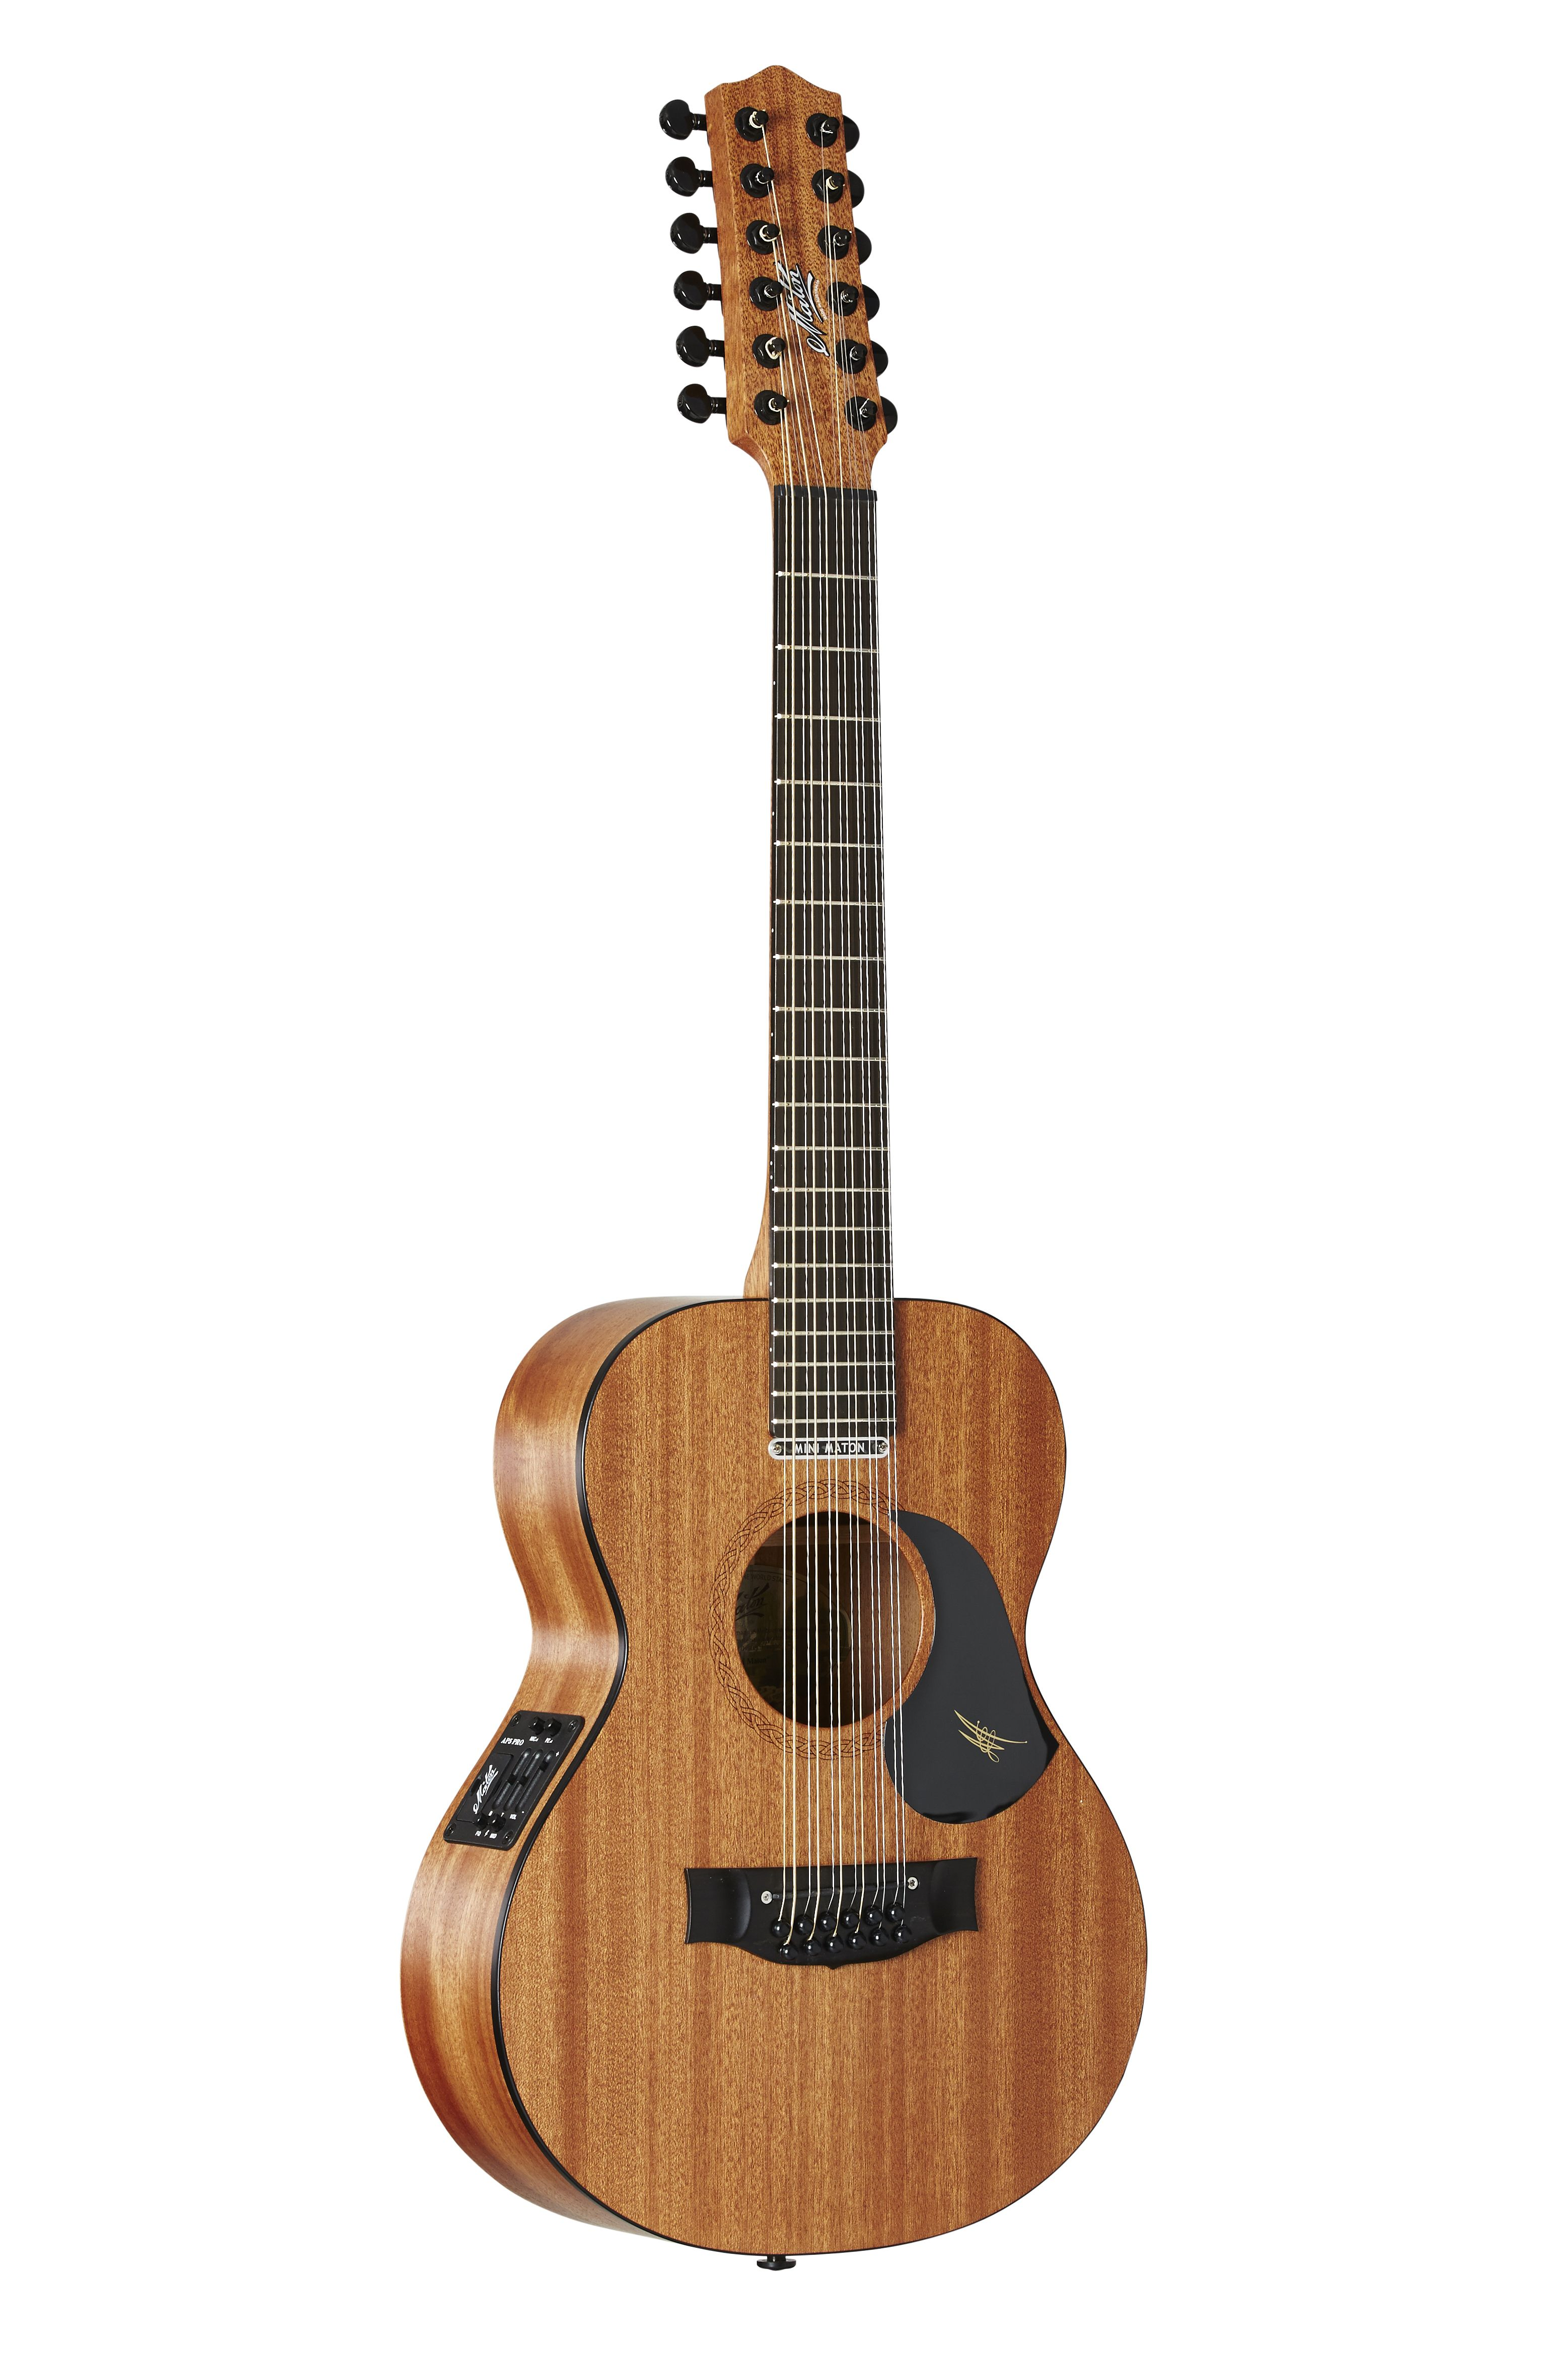 Australian, Handmade, Acoustic EMM 12 from Maton Guitars. Side View ...